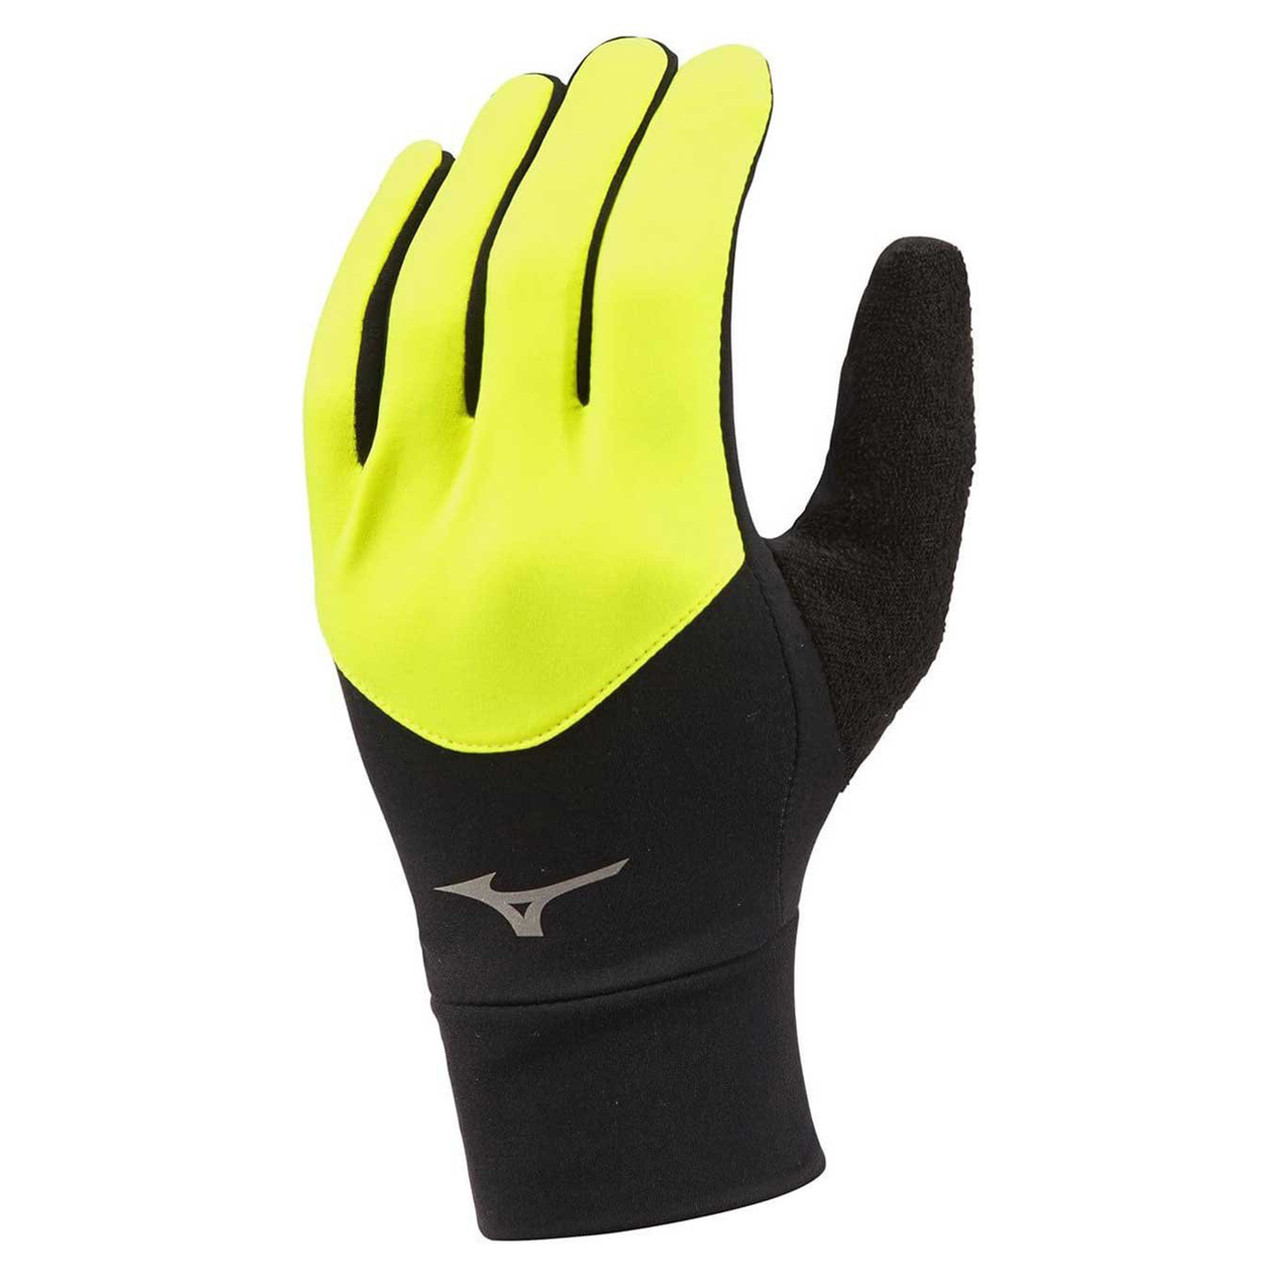 Перчатки термо Mizuno Warmalite Glove J2GY75011-45